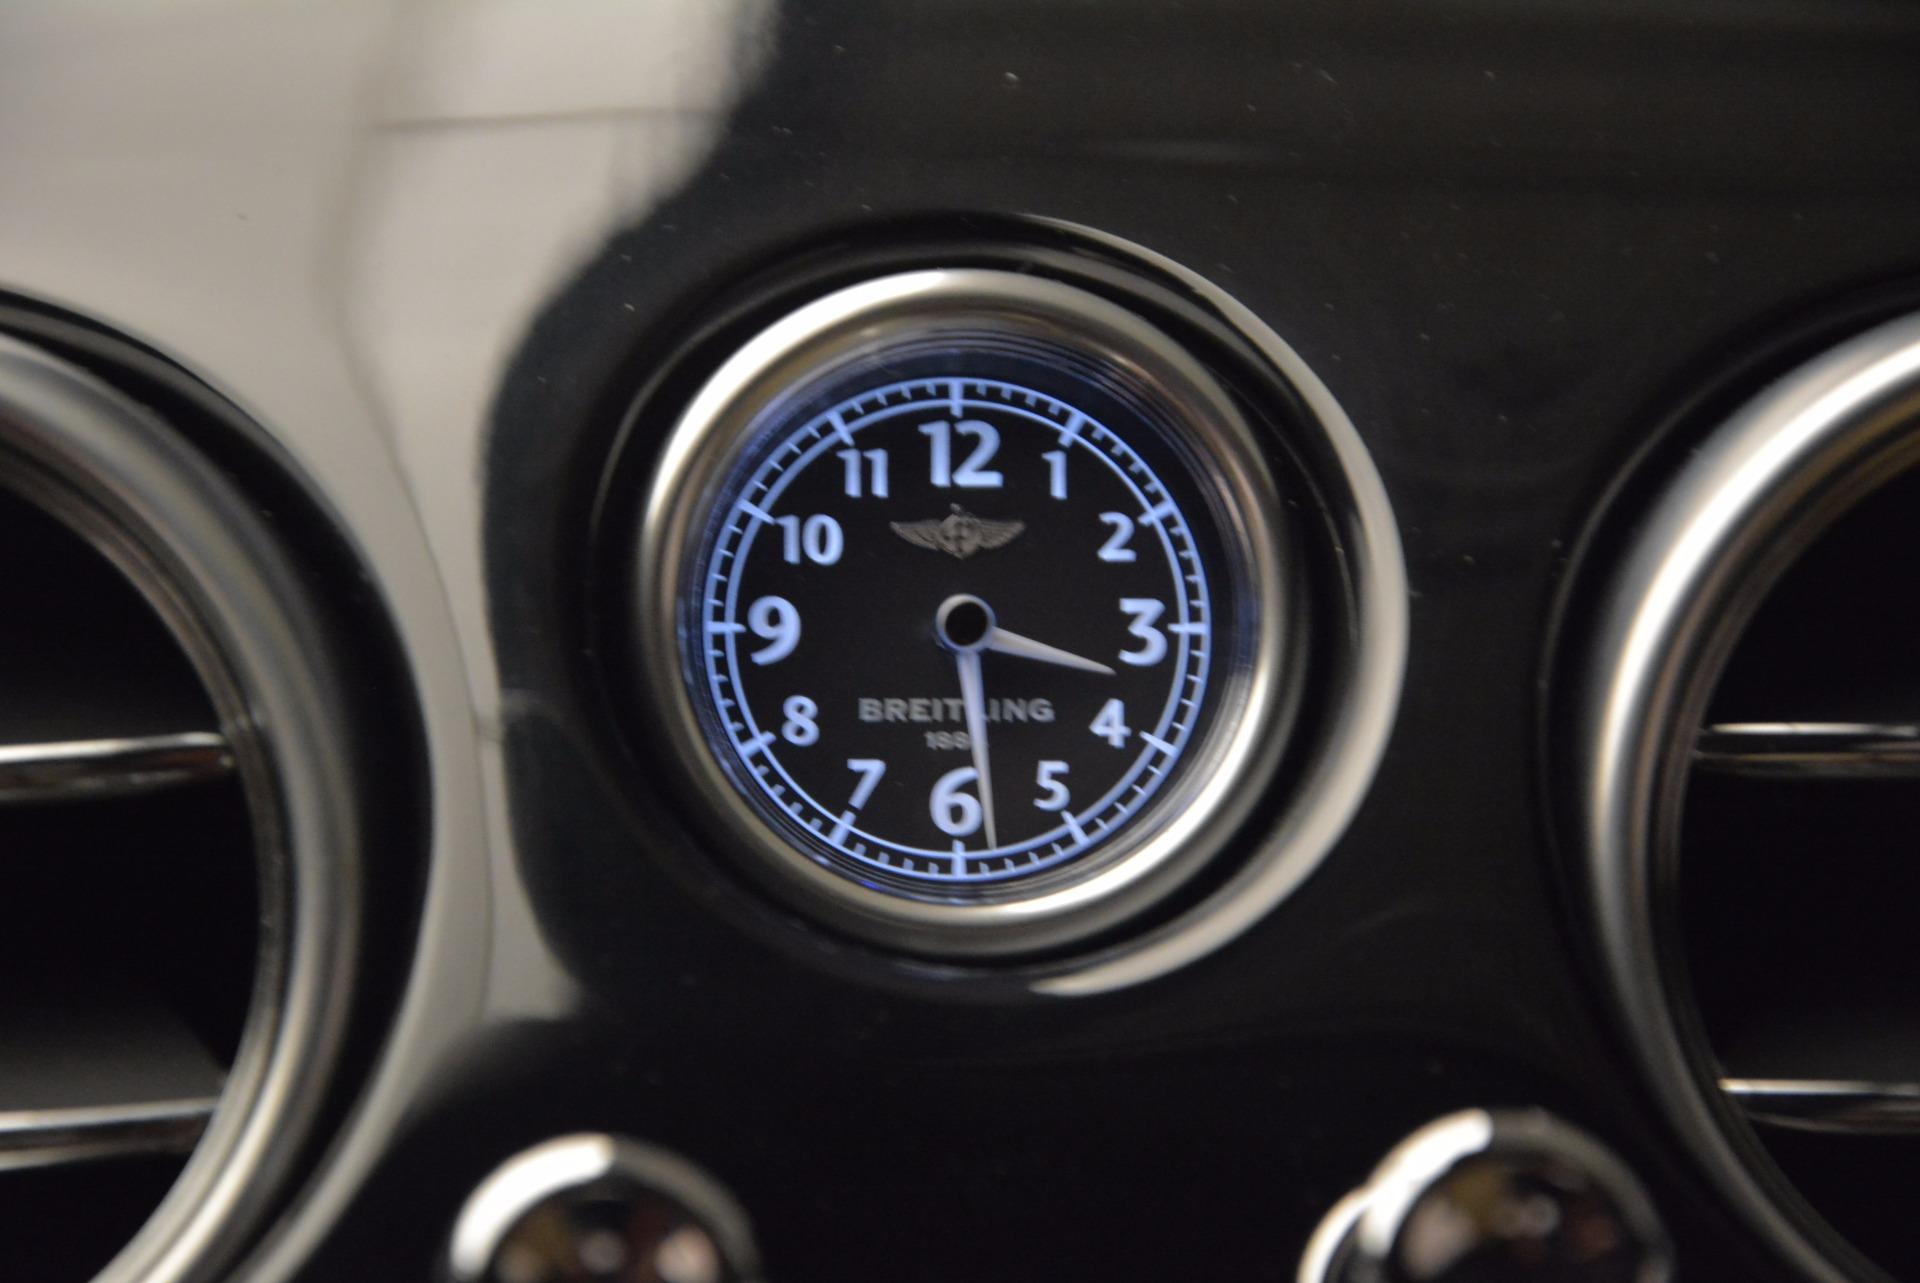 Used 2008 Bentley Continental GT Speed For Sale In Westport, CT 1552_p25